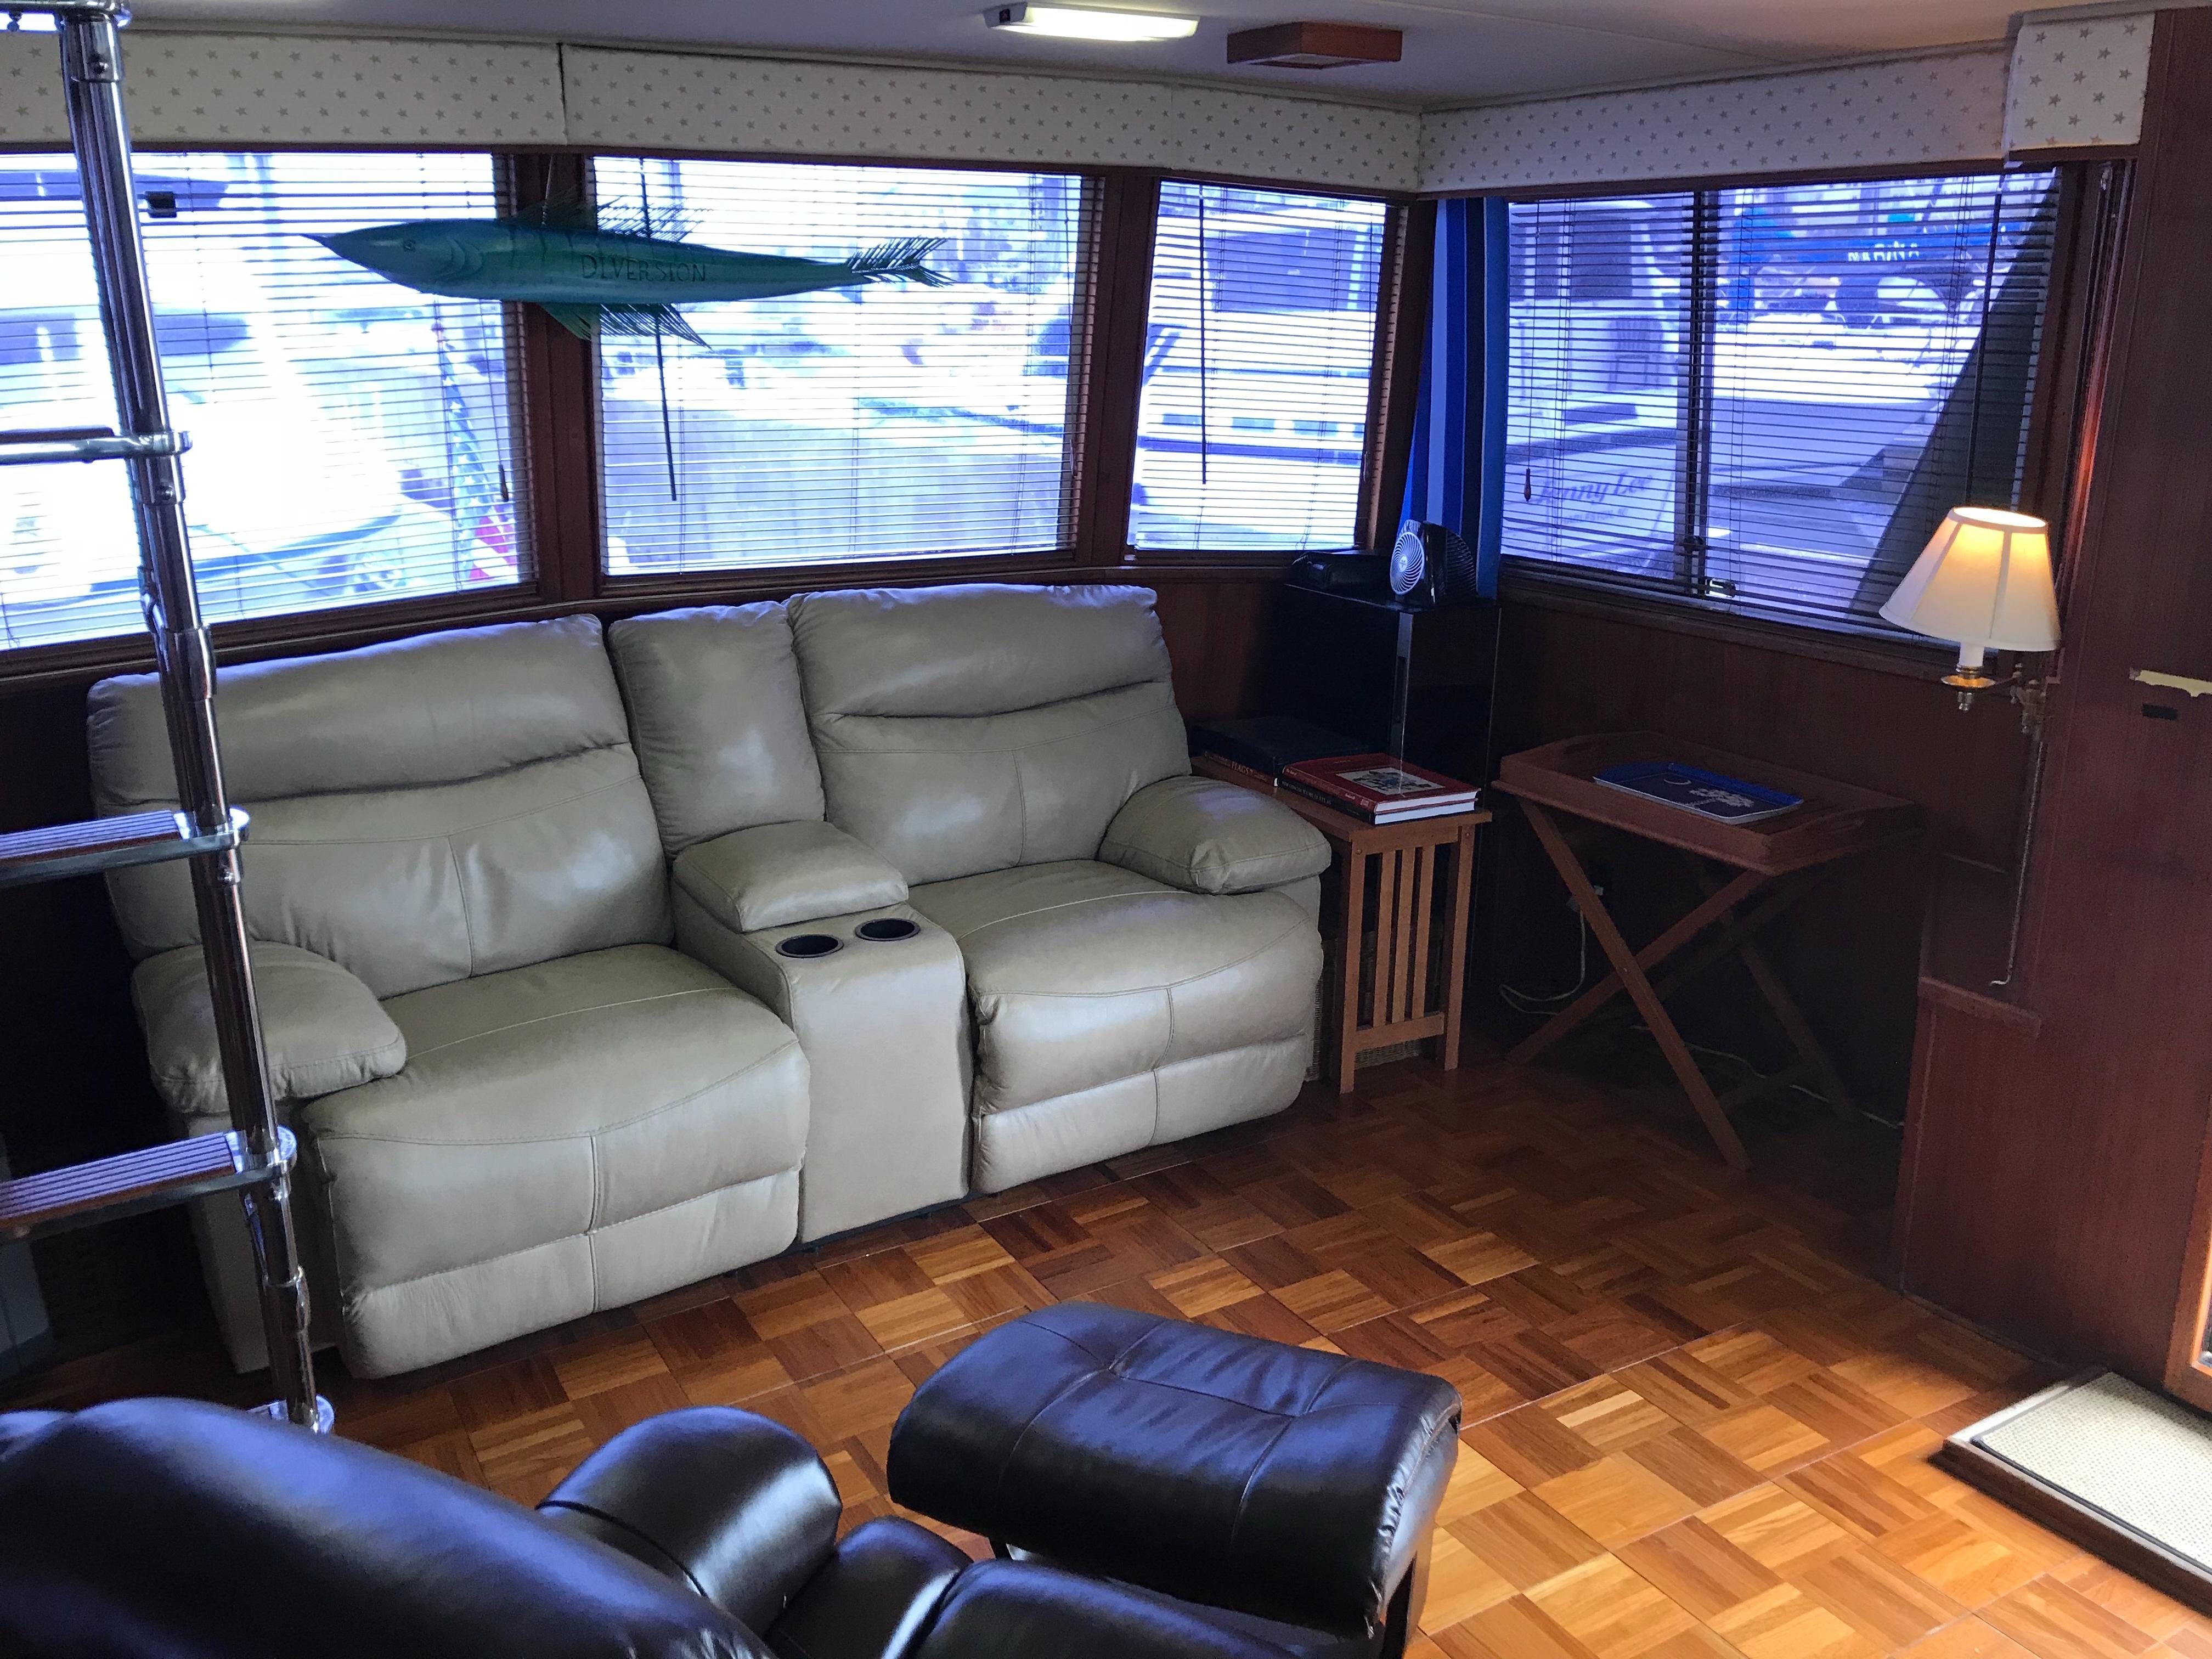 Chris-craft 46 Constellation - Upper Salon to Port